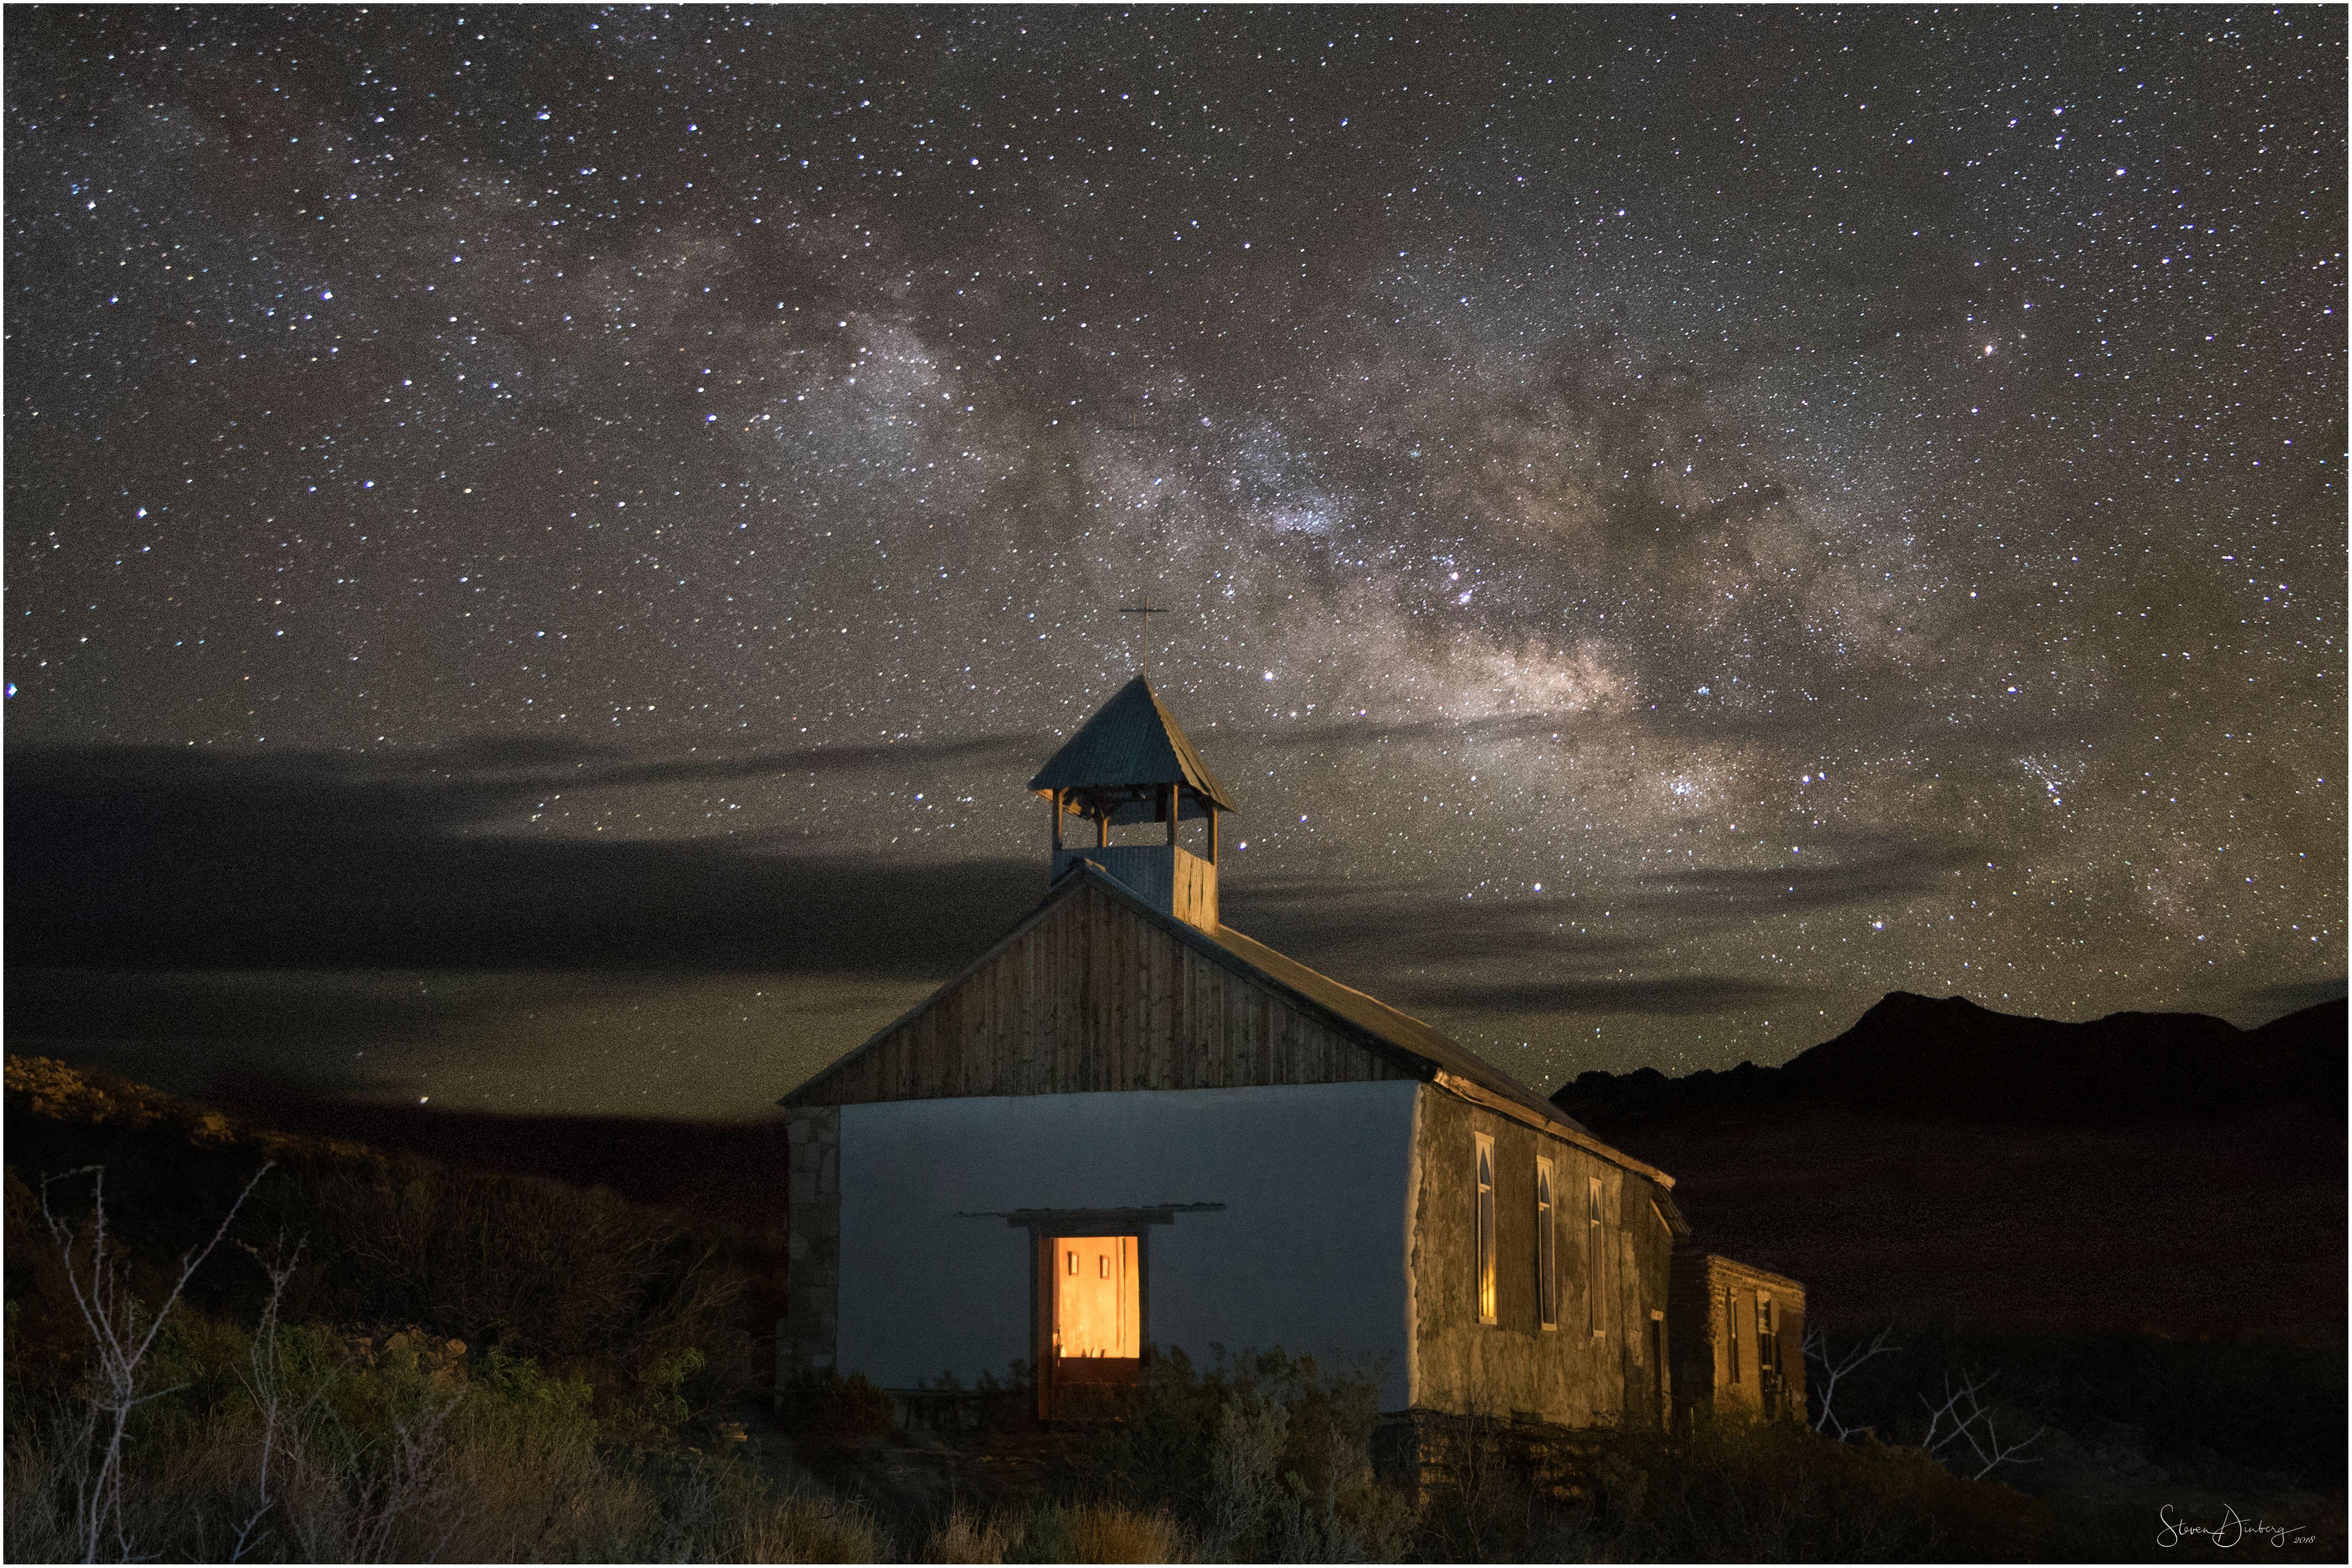 Terilingua GhostTown Milky Way.jpg